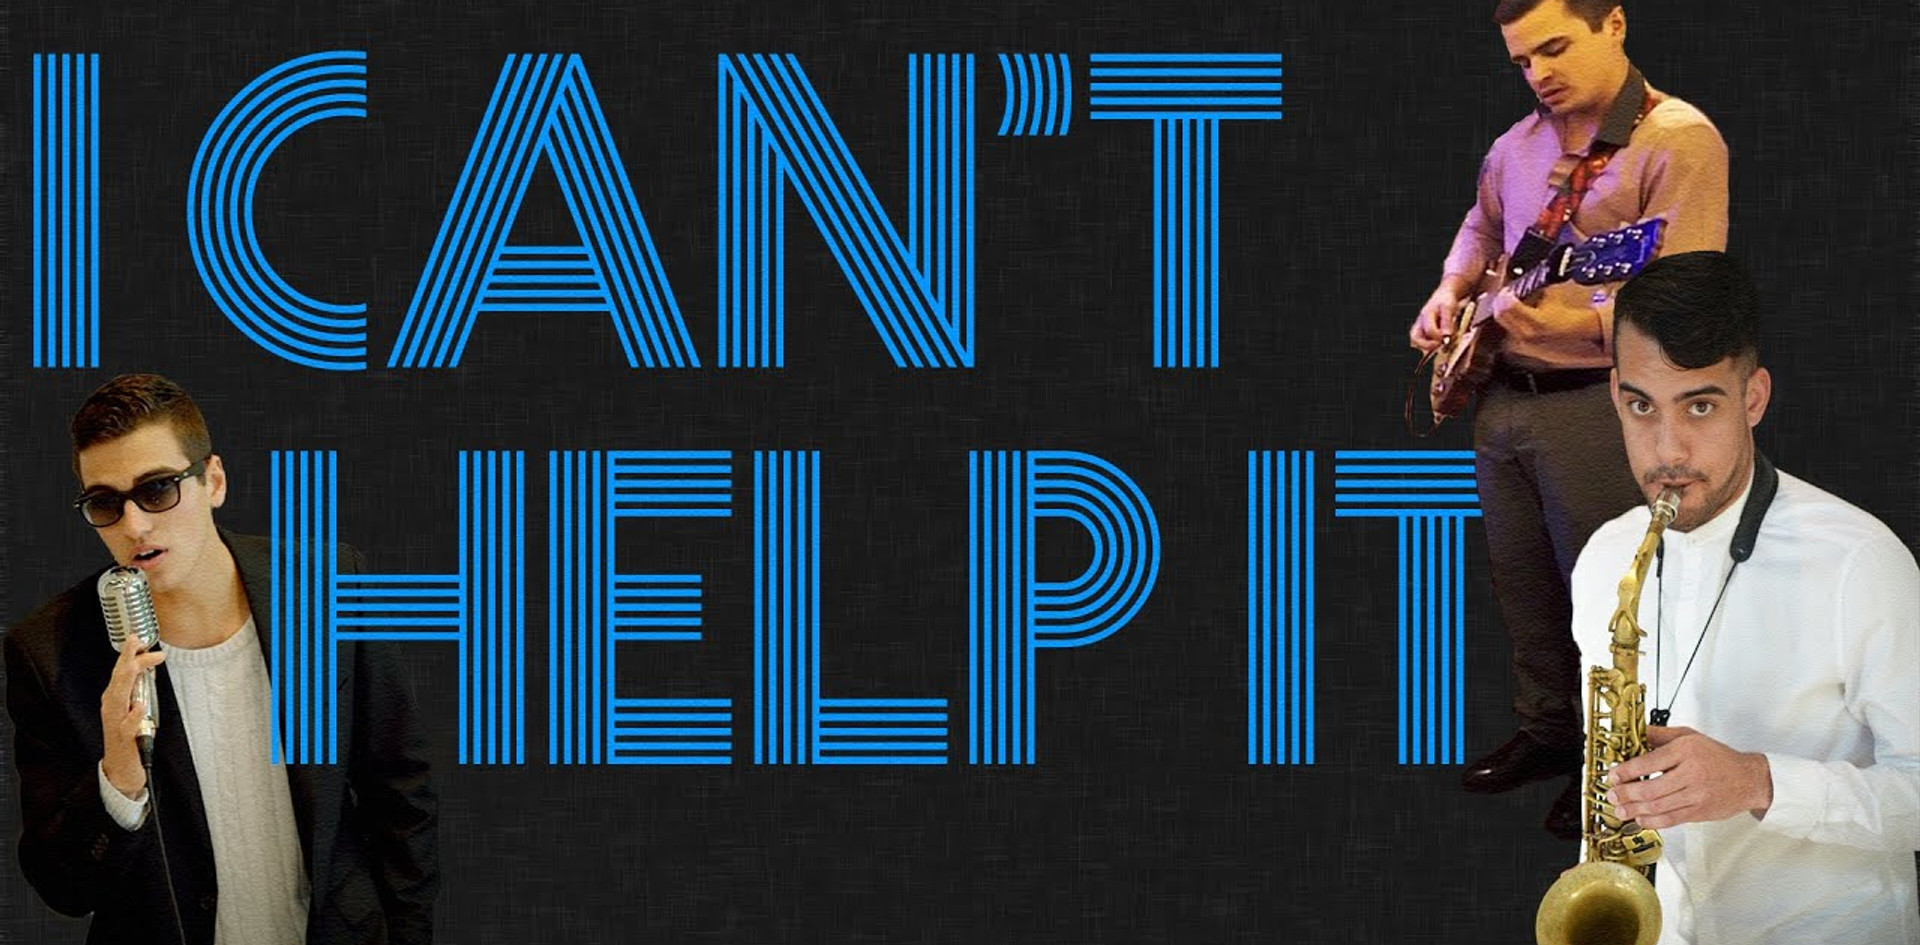 THOMAS ALLAIN & CARLOS VIZOSO — I Can't Help It (Michael Jackson)